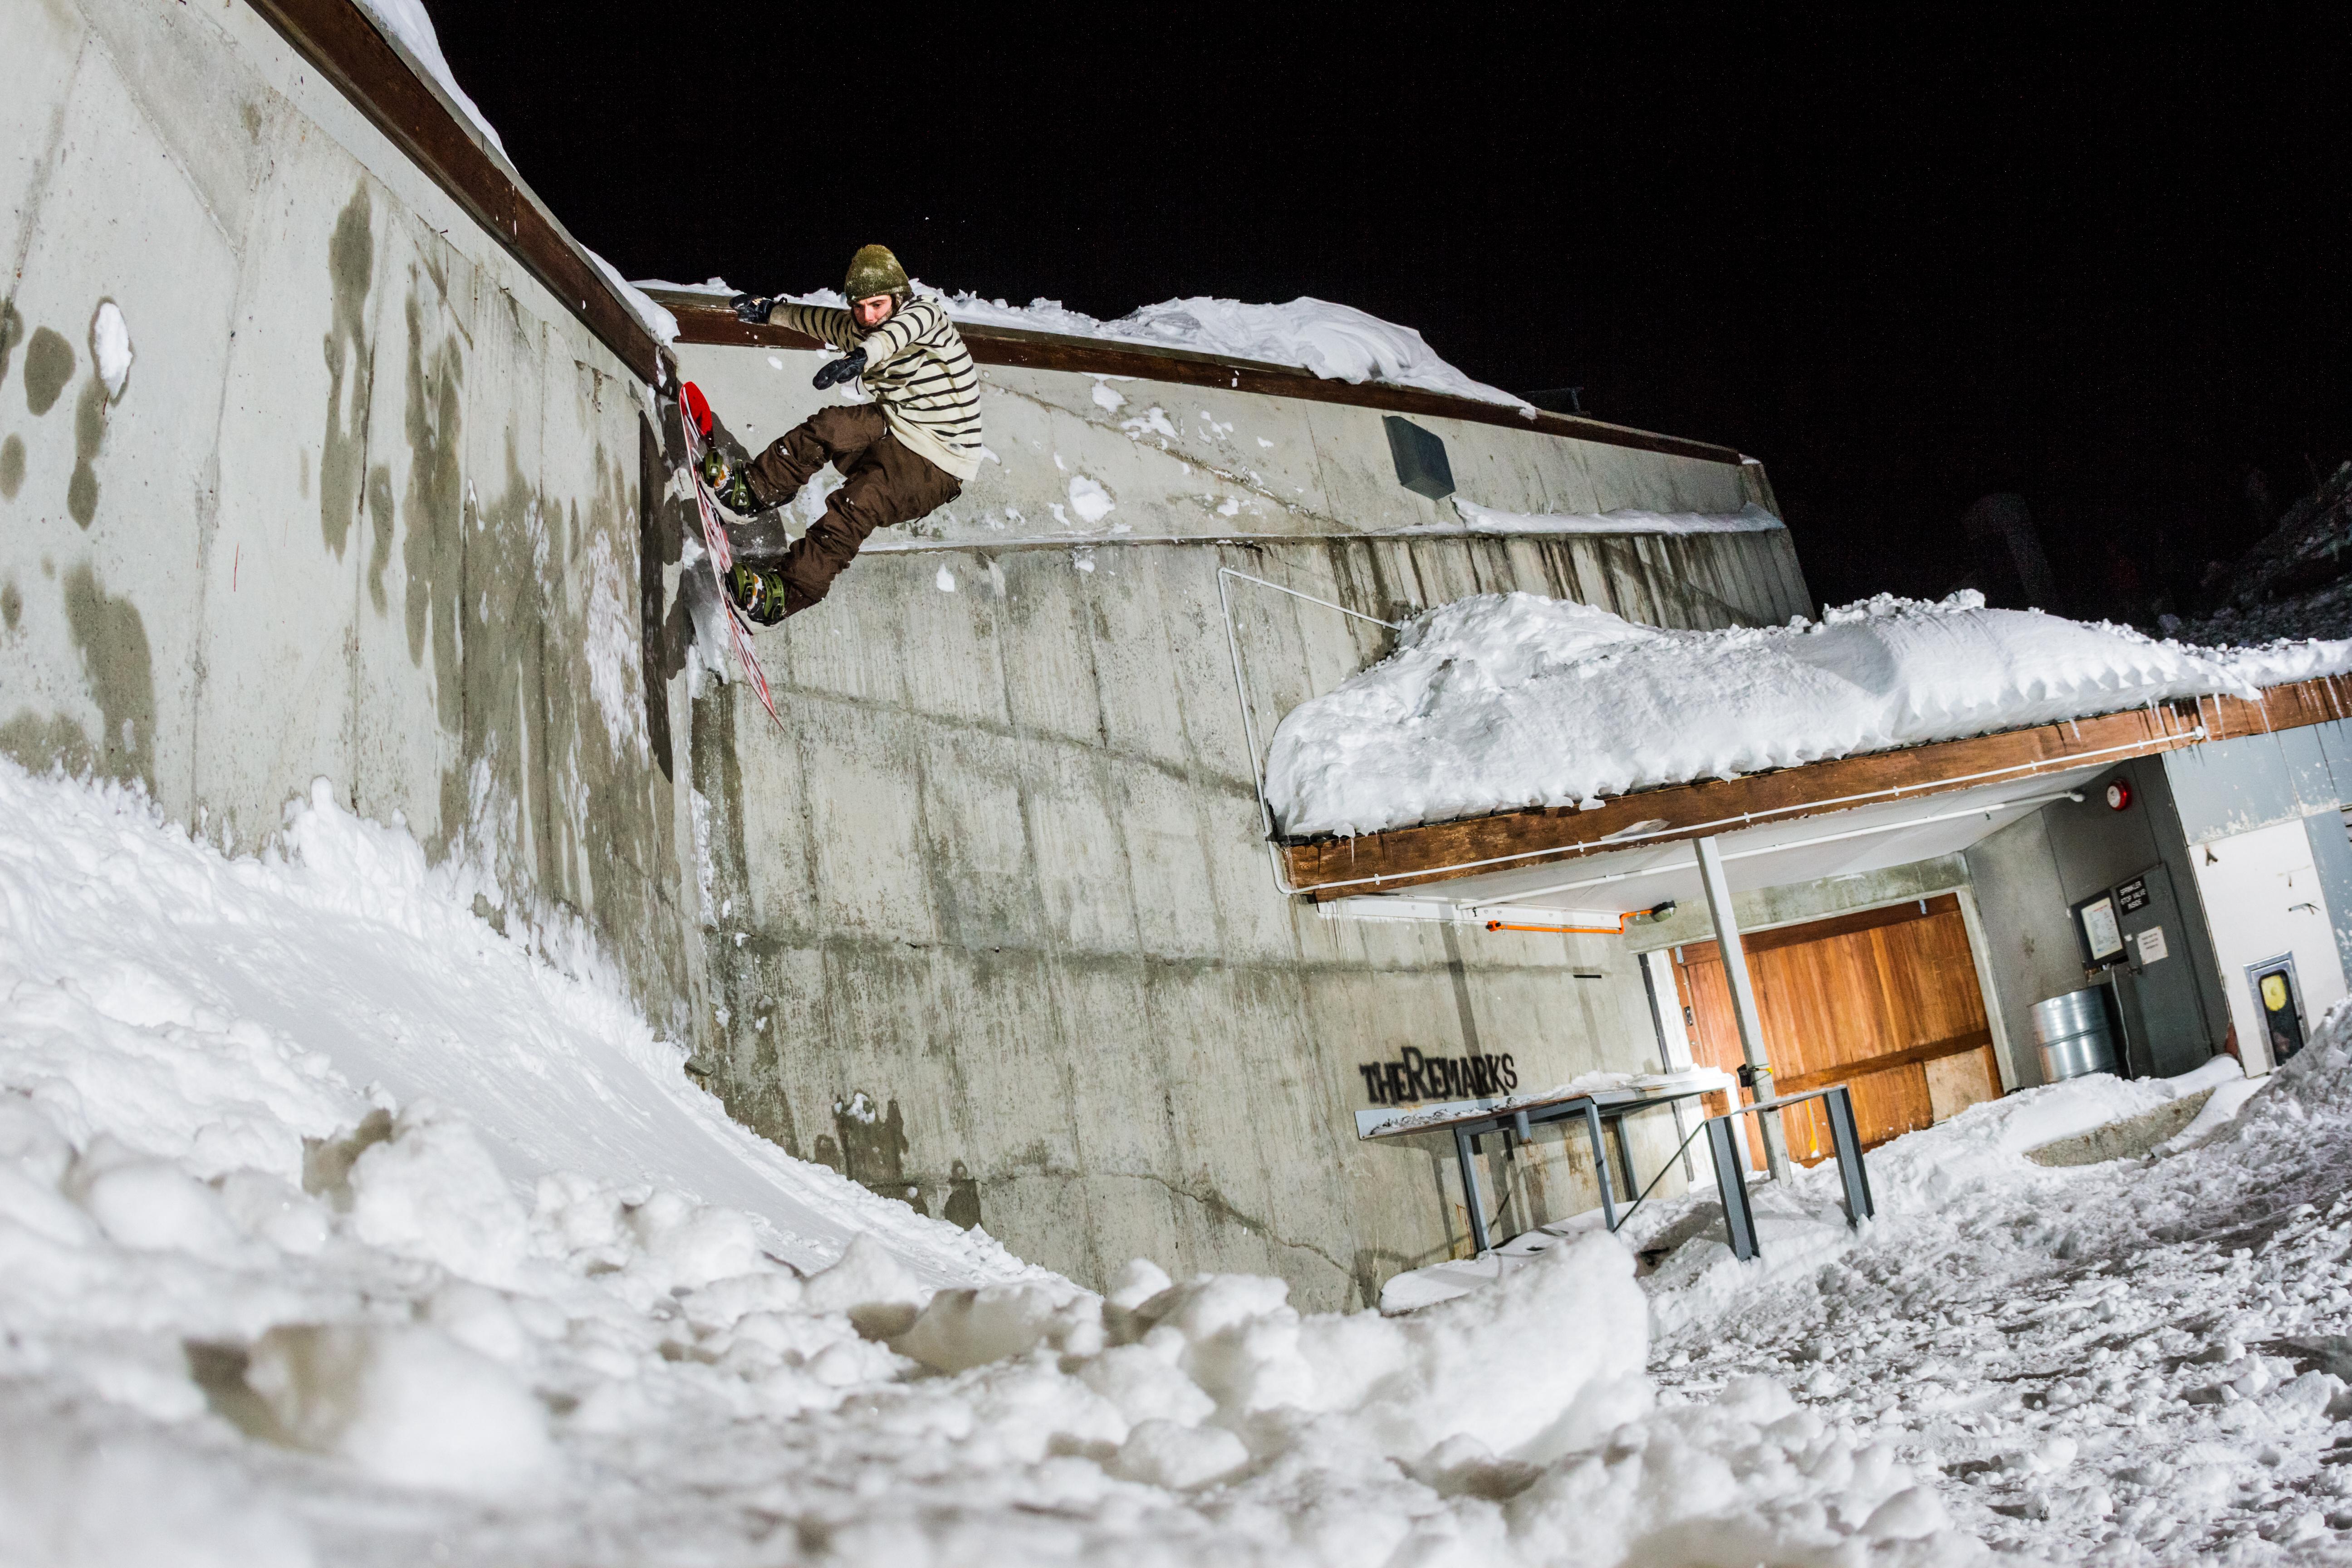 Morgan Schofield 50-50 to wall ride